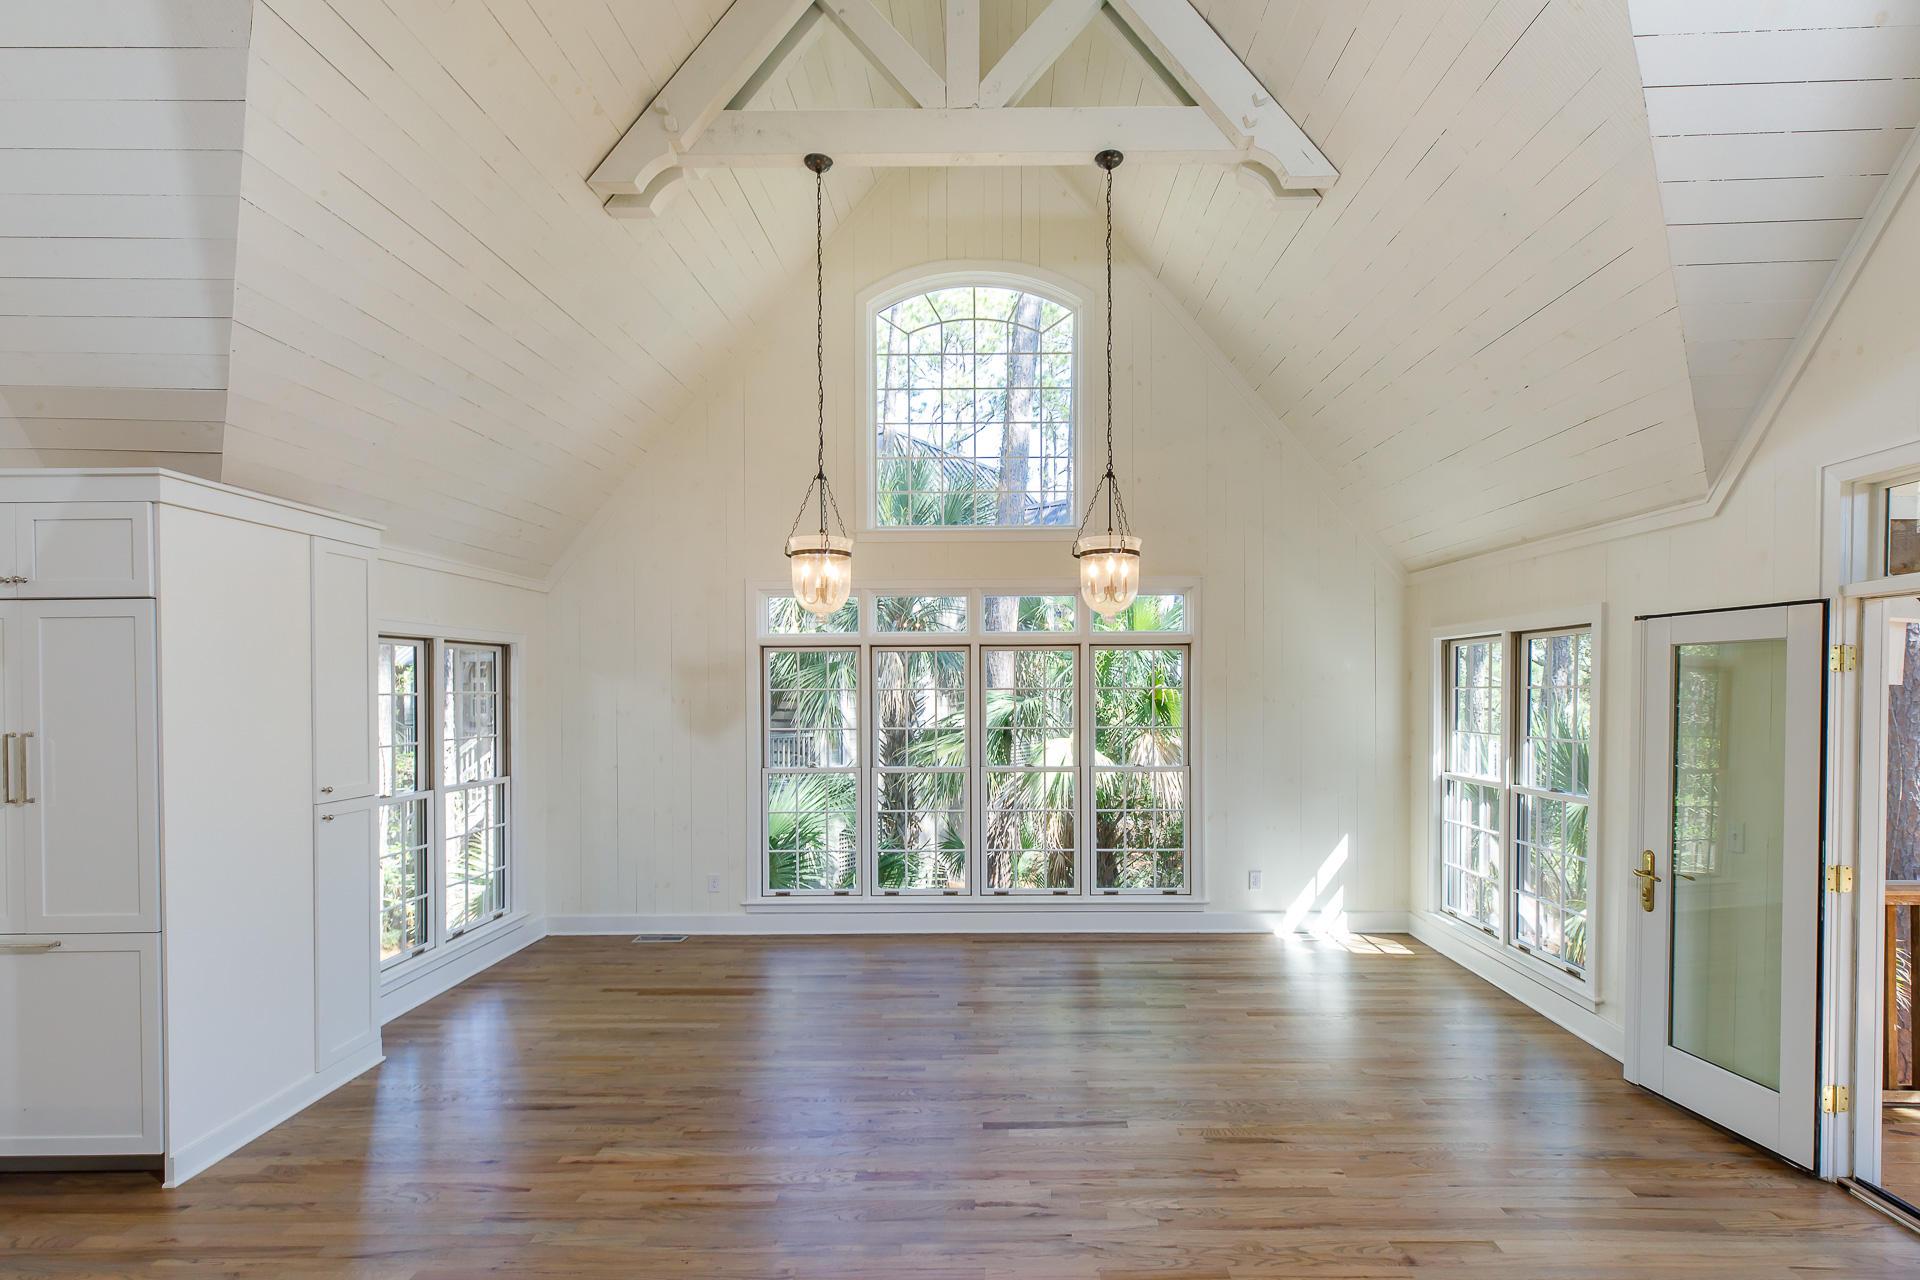 Kiawah Island Homes For Sale - 29 Marsh Cottage, Kiawah Island, SC - 12